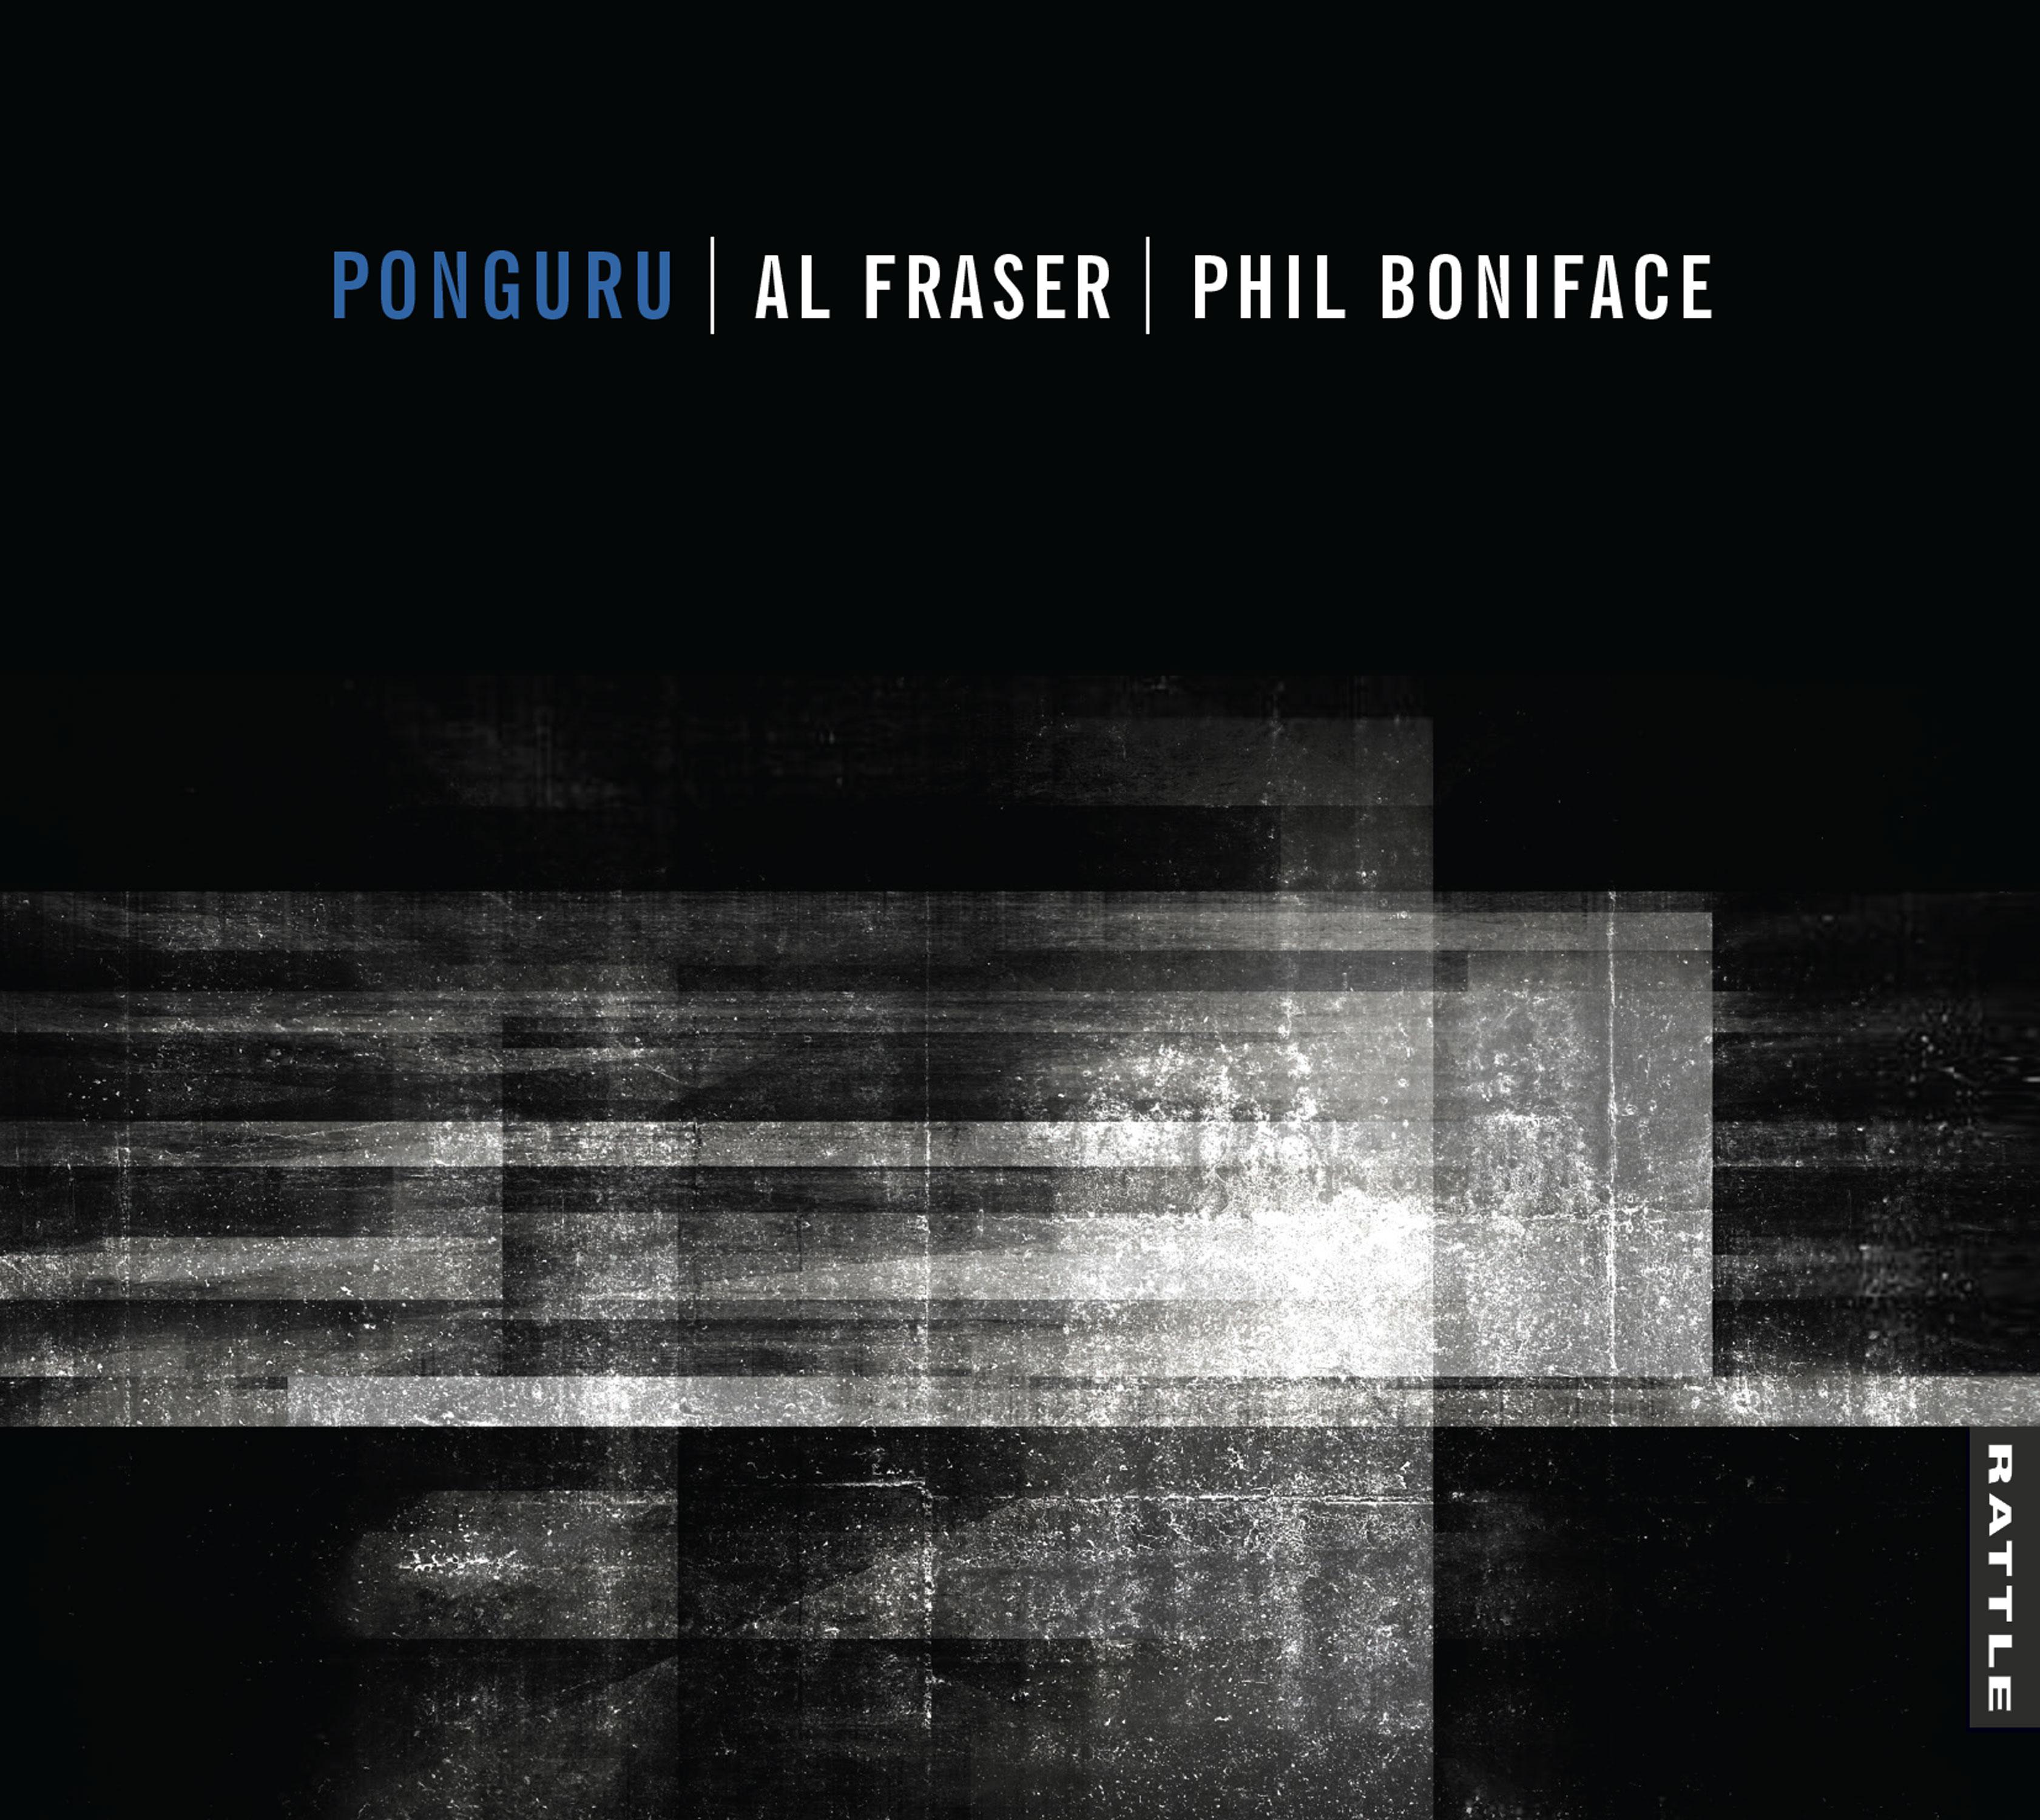 Al Fraser and Phil Boniface | Ponguru - downloadable MP3 ALBUM